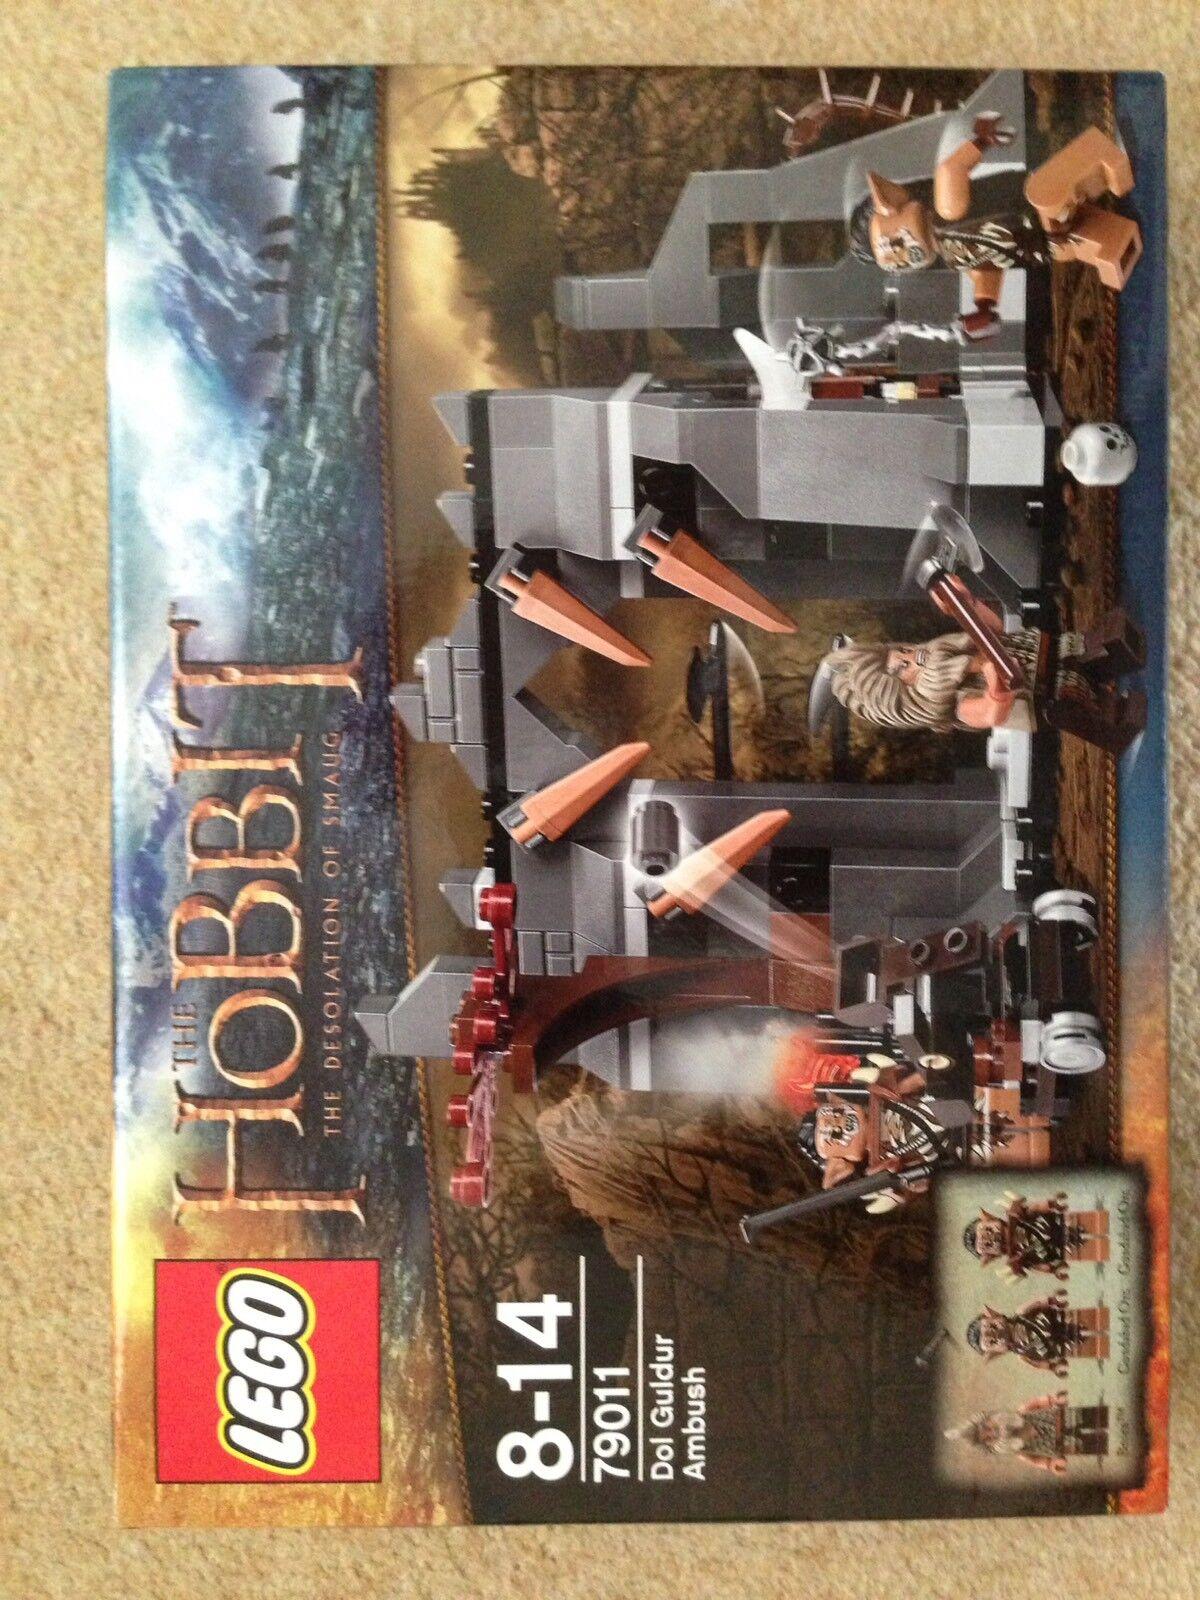 Lego 79011 The Hobbit Dol Guldur Ambush BNISB 2013